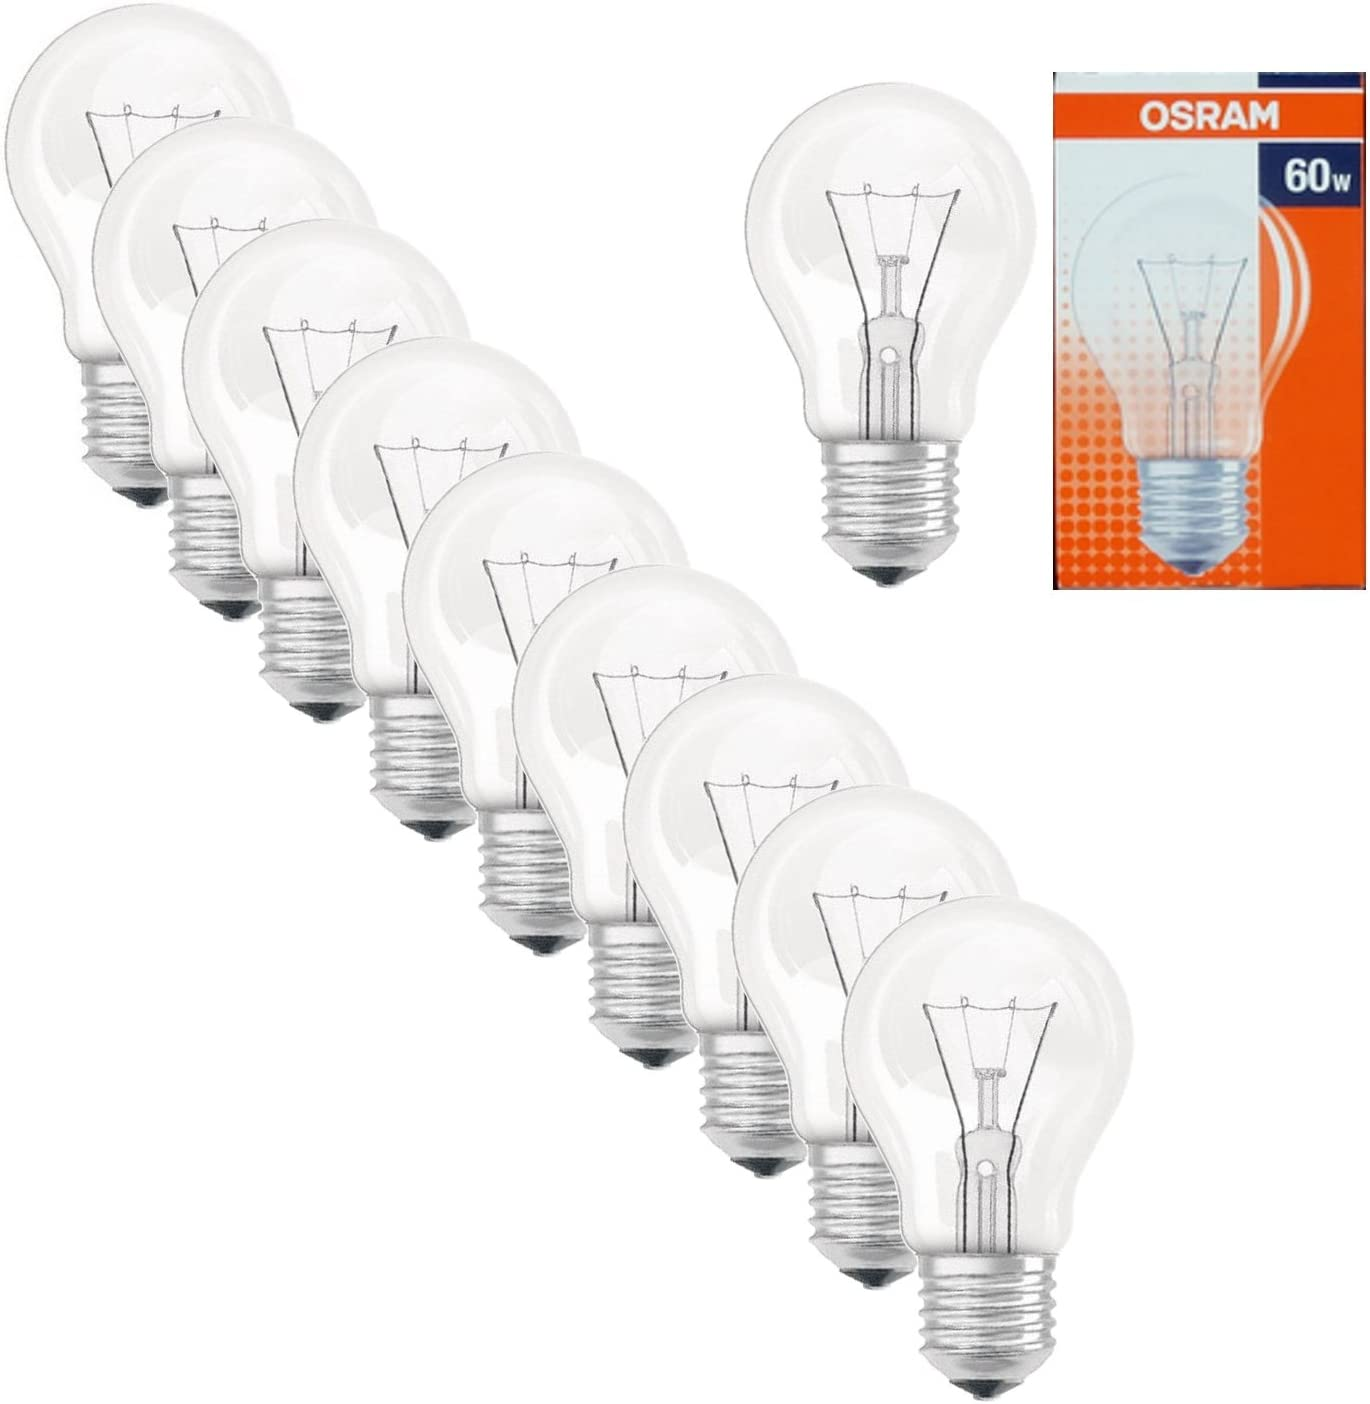 Glühlampe 60V 50mA T6,8 6,8x44mm Glühbirne Lampe Birne 60Volt 50mA neu